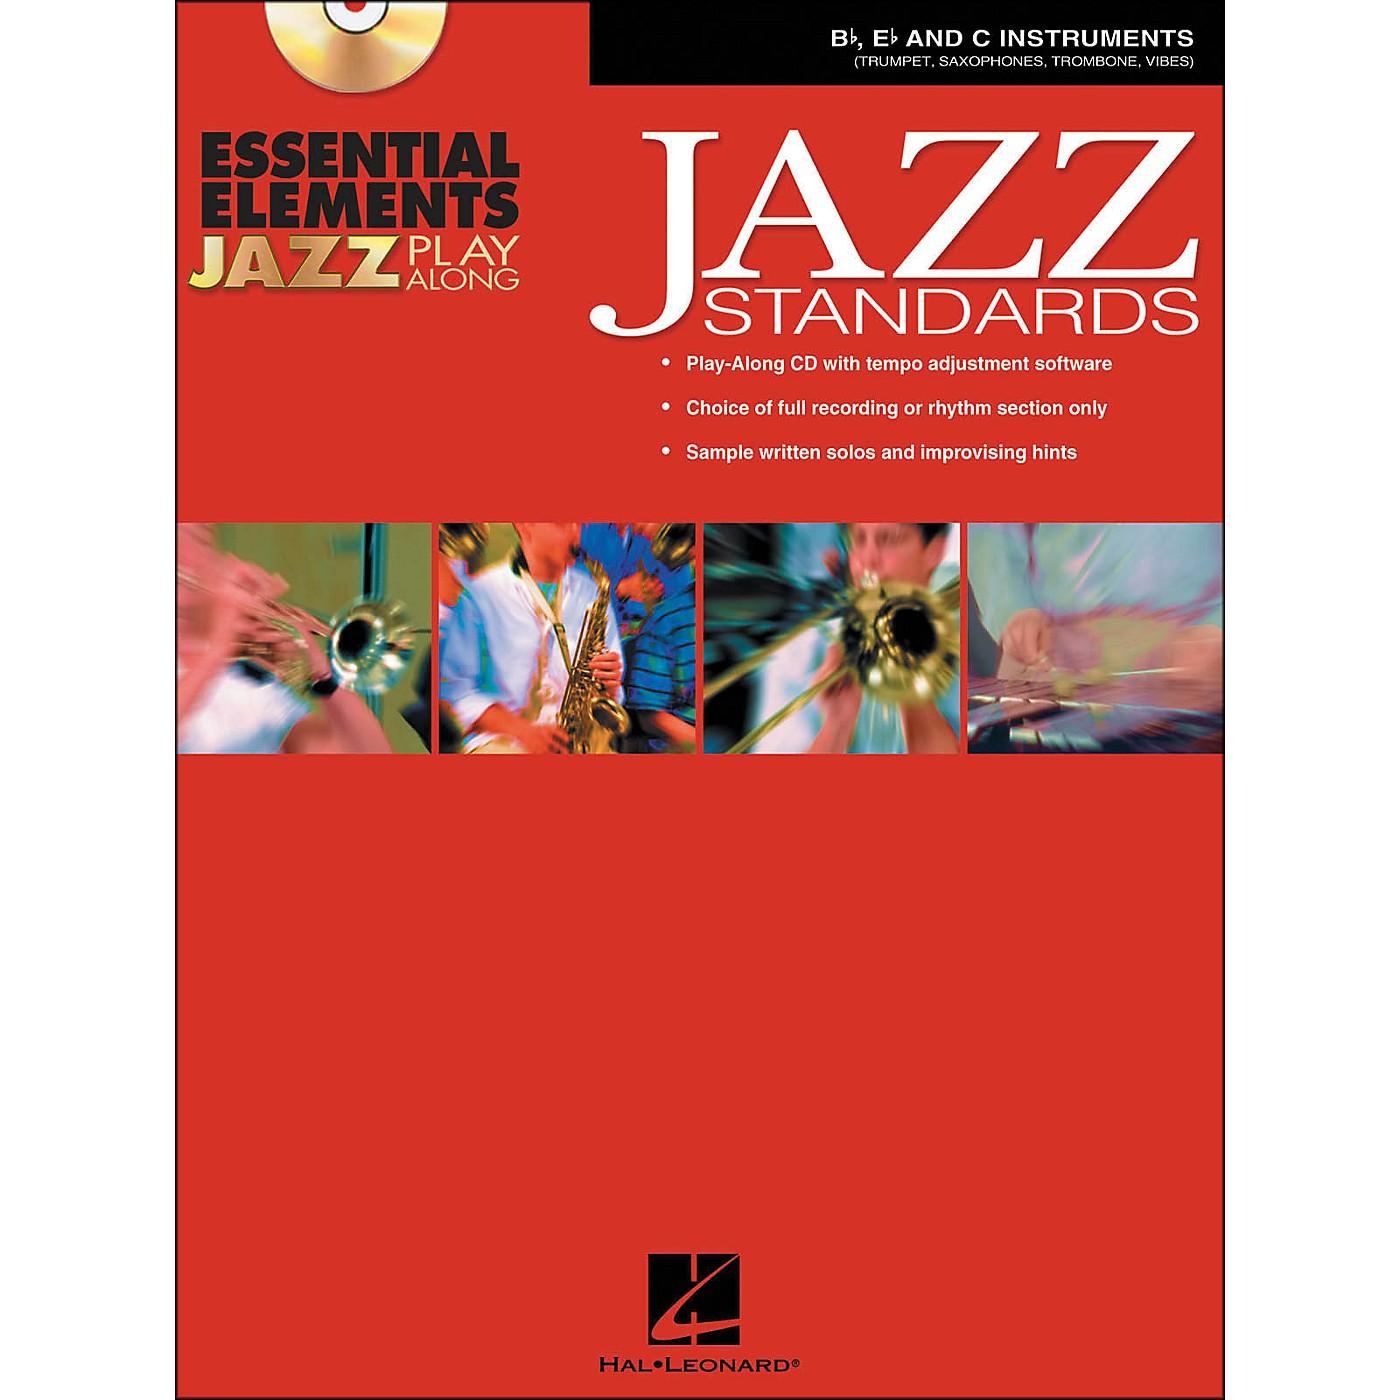 Hal Leonard EE Jazz Play Along: Jazz Standards B-Flat, E-Flat And C Instruments Book/CD-Rom thumbnail